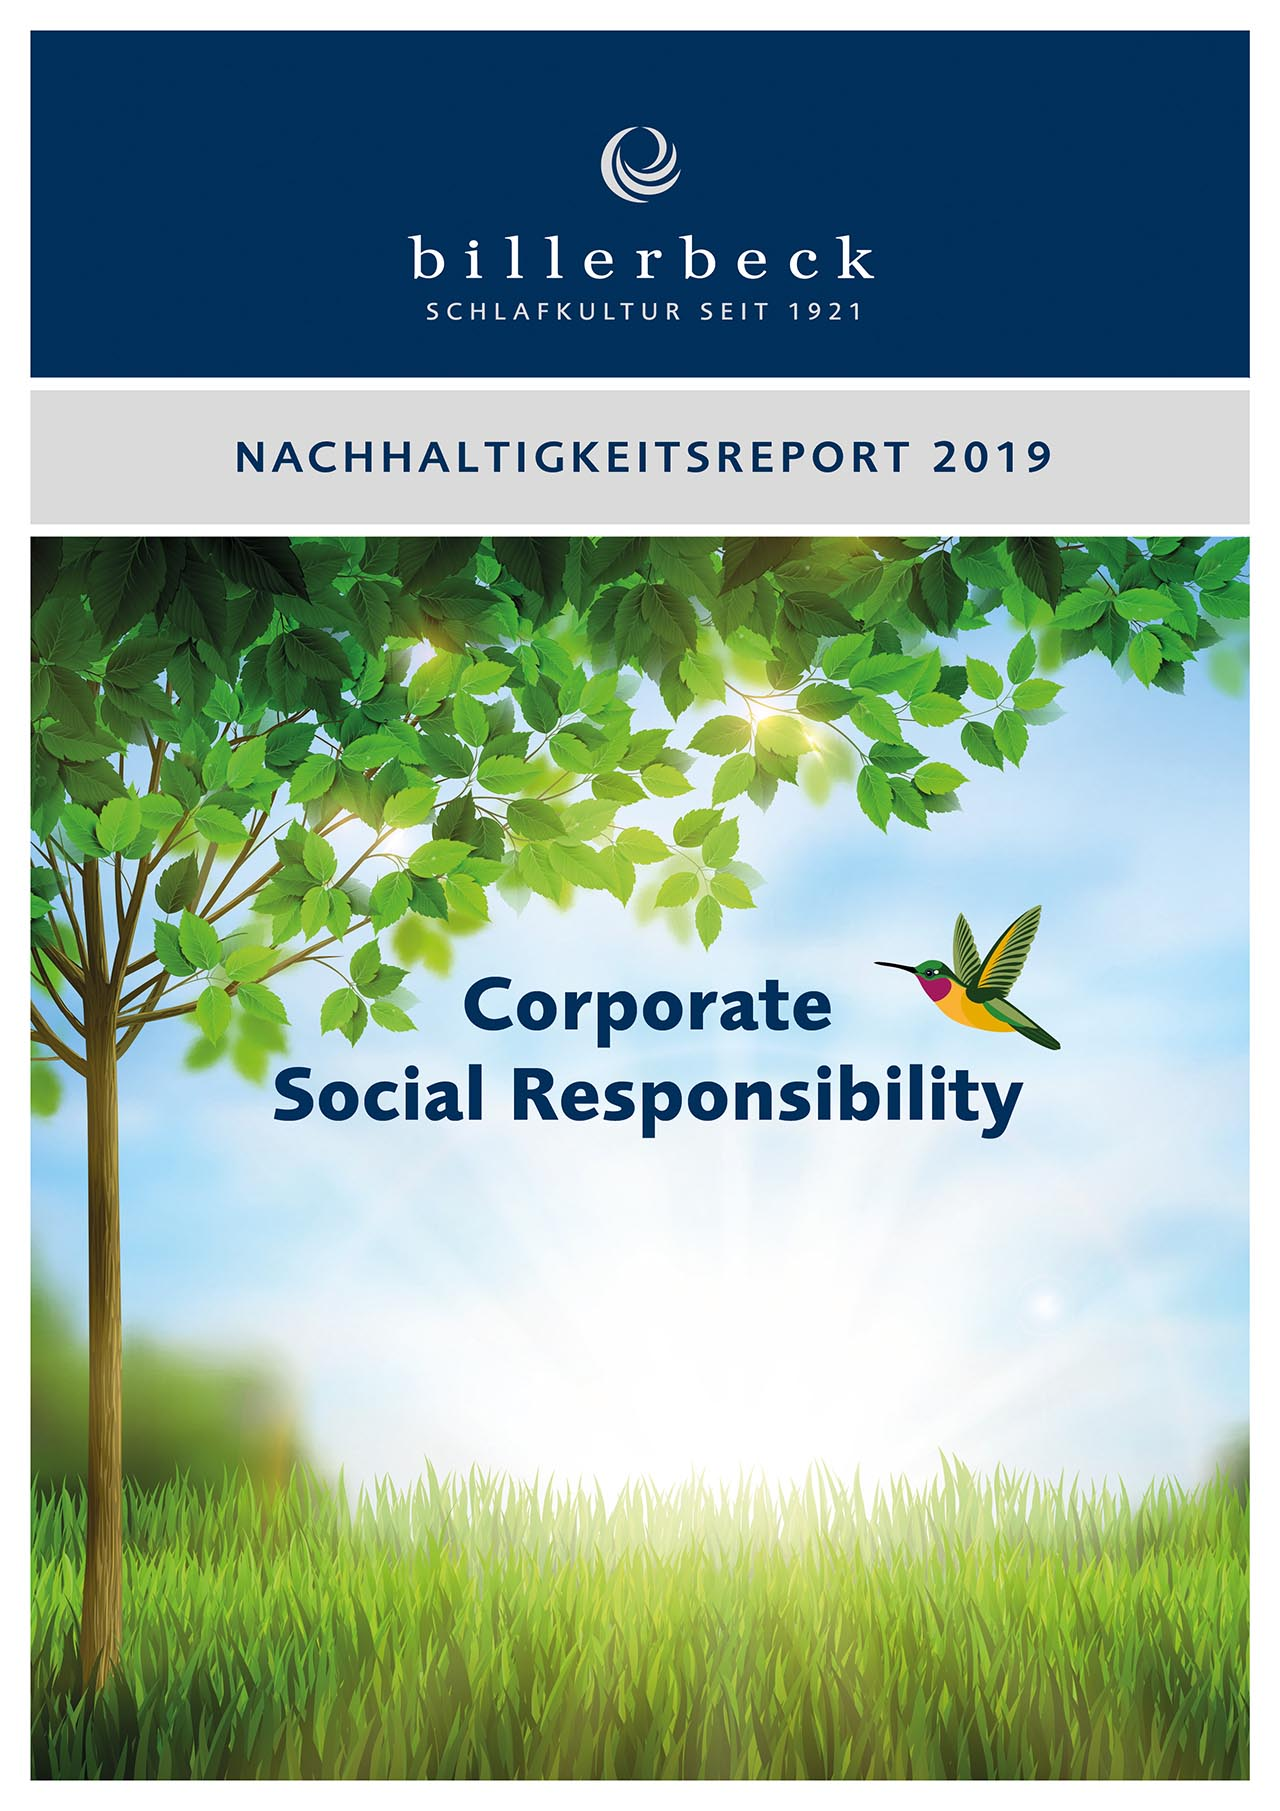 billerbeck CSR-Report